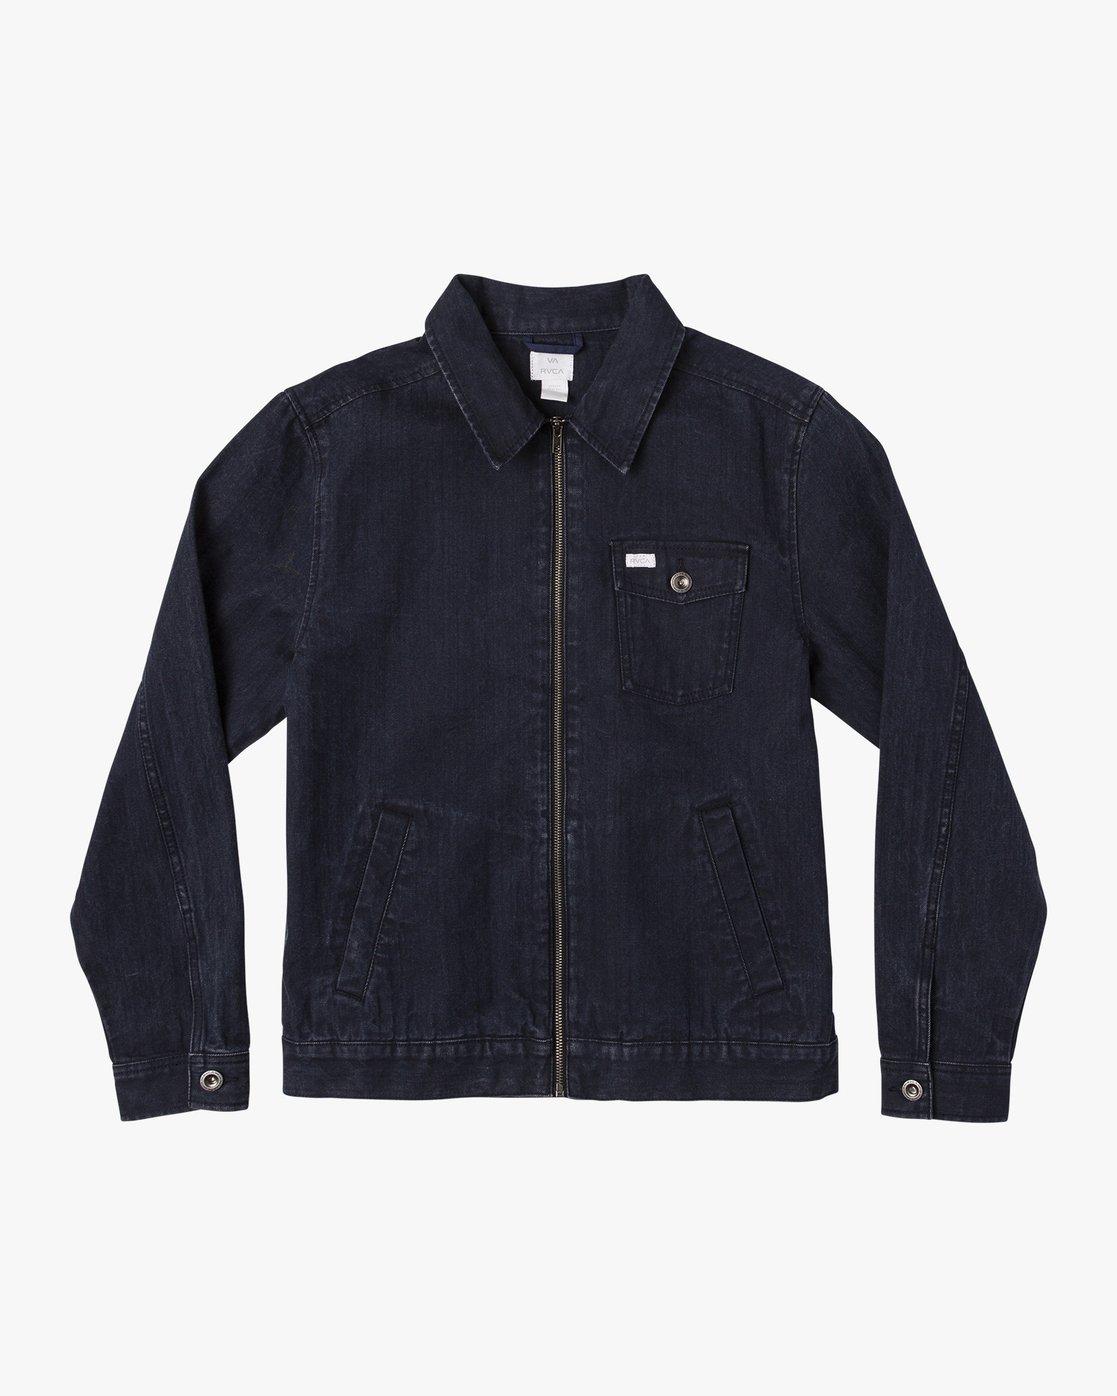 0 Hi - rade - Jeans-Jacke für Männer Blau Q1JKRFRVF9 RVCA